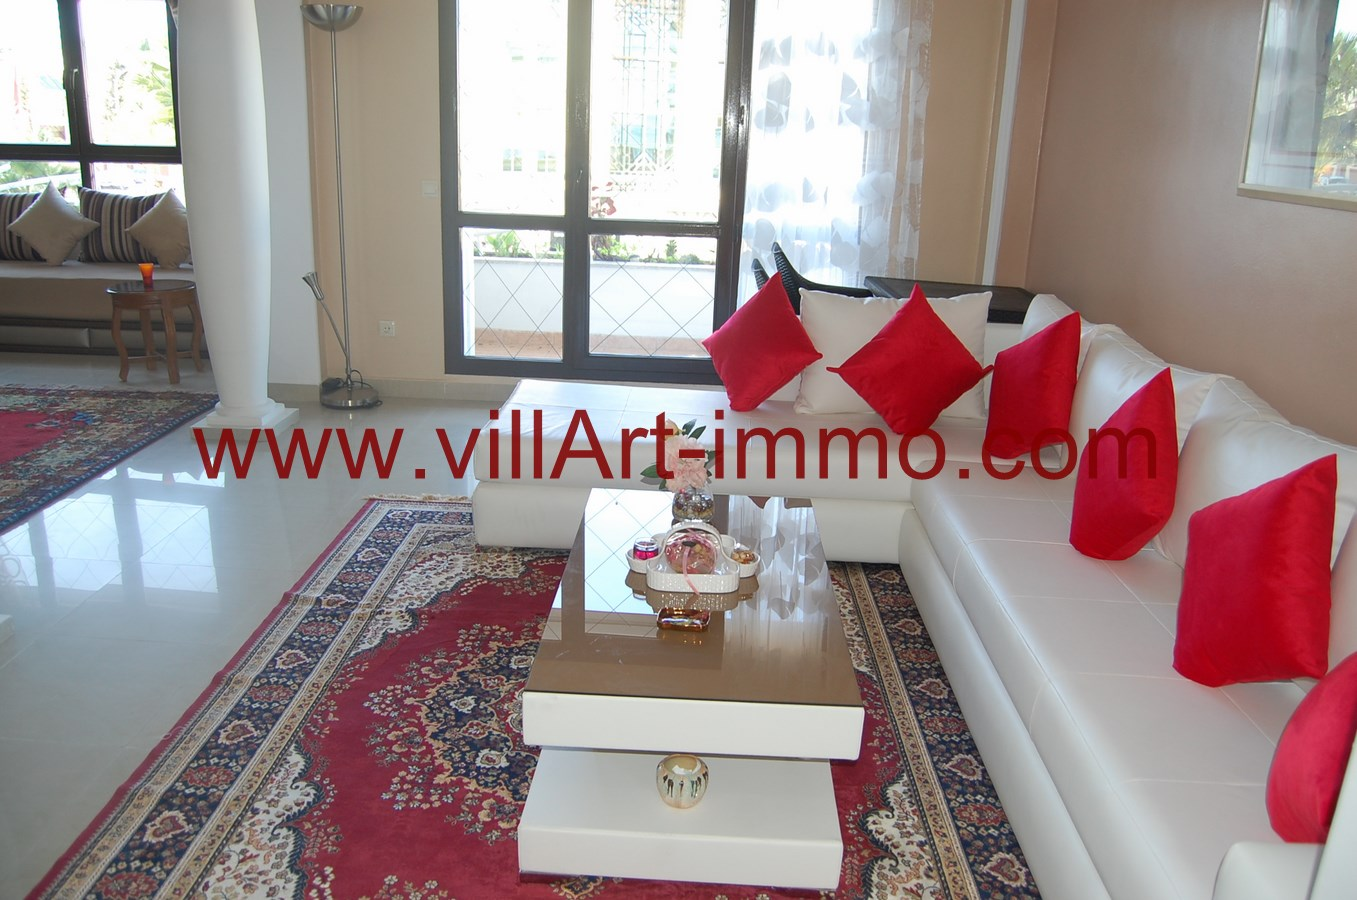 A vendre appartement f4 tanger quartier ibieria villart for Chambre de commerce tanger